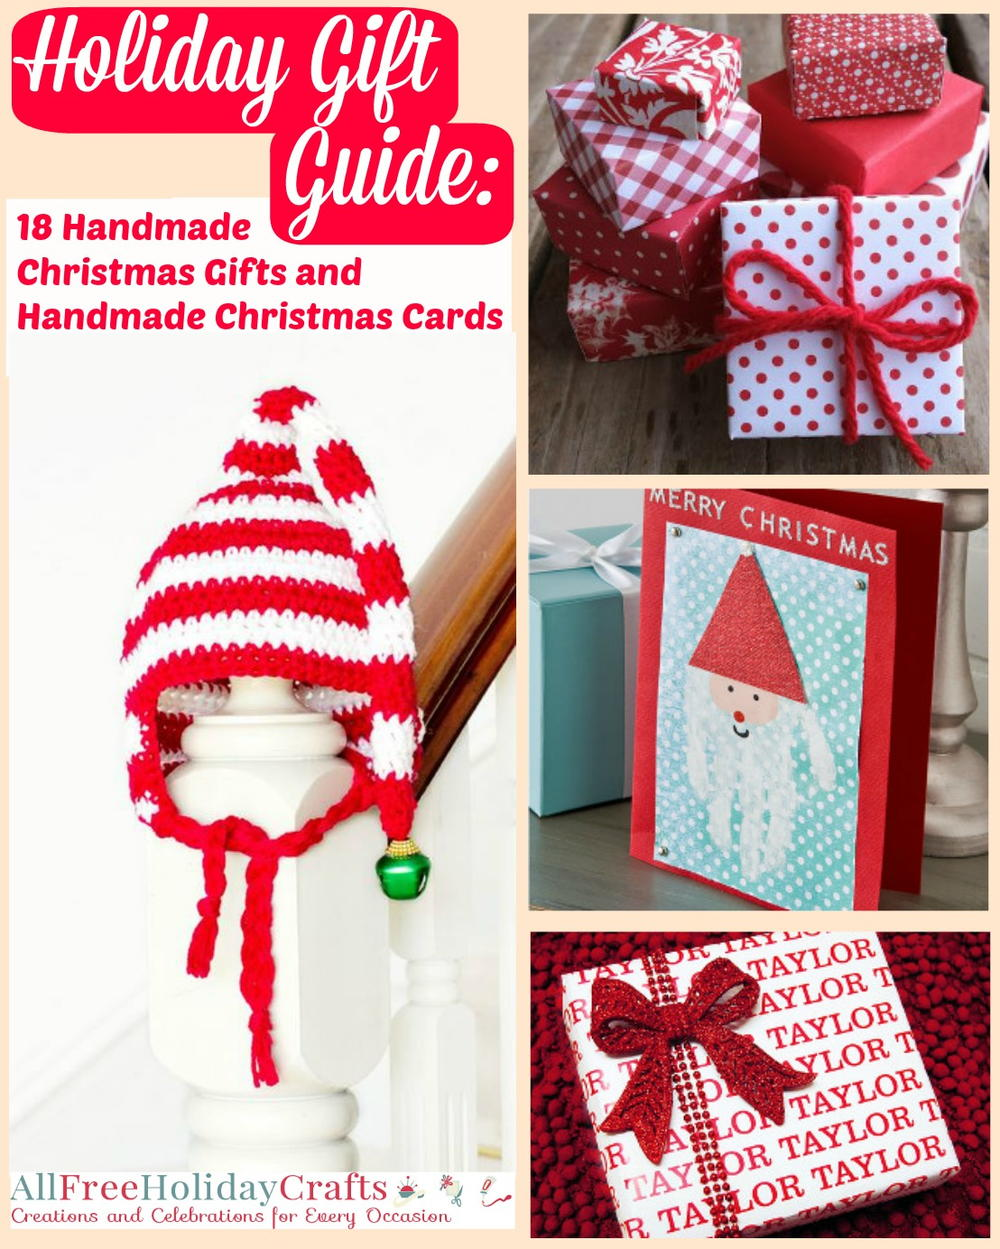 Holiday gift guide 18 handmade christmas gifts and for Handmade christmas gifts to sell